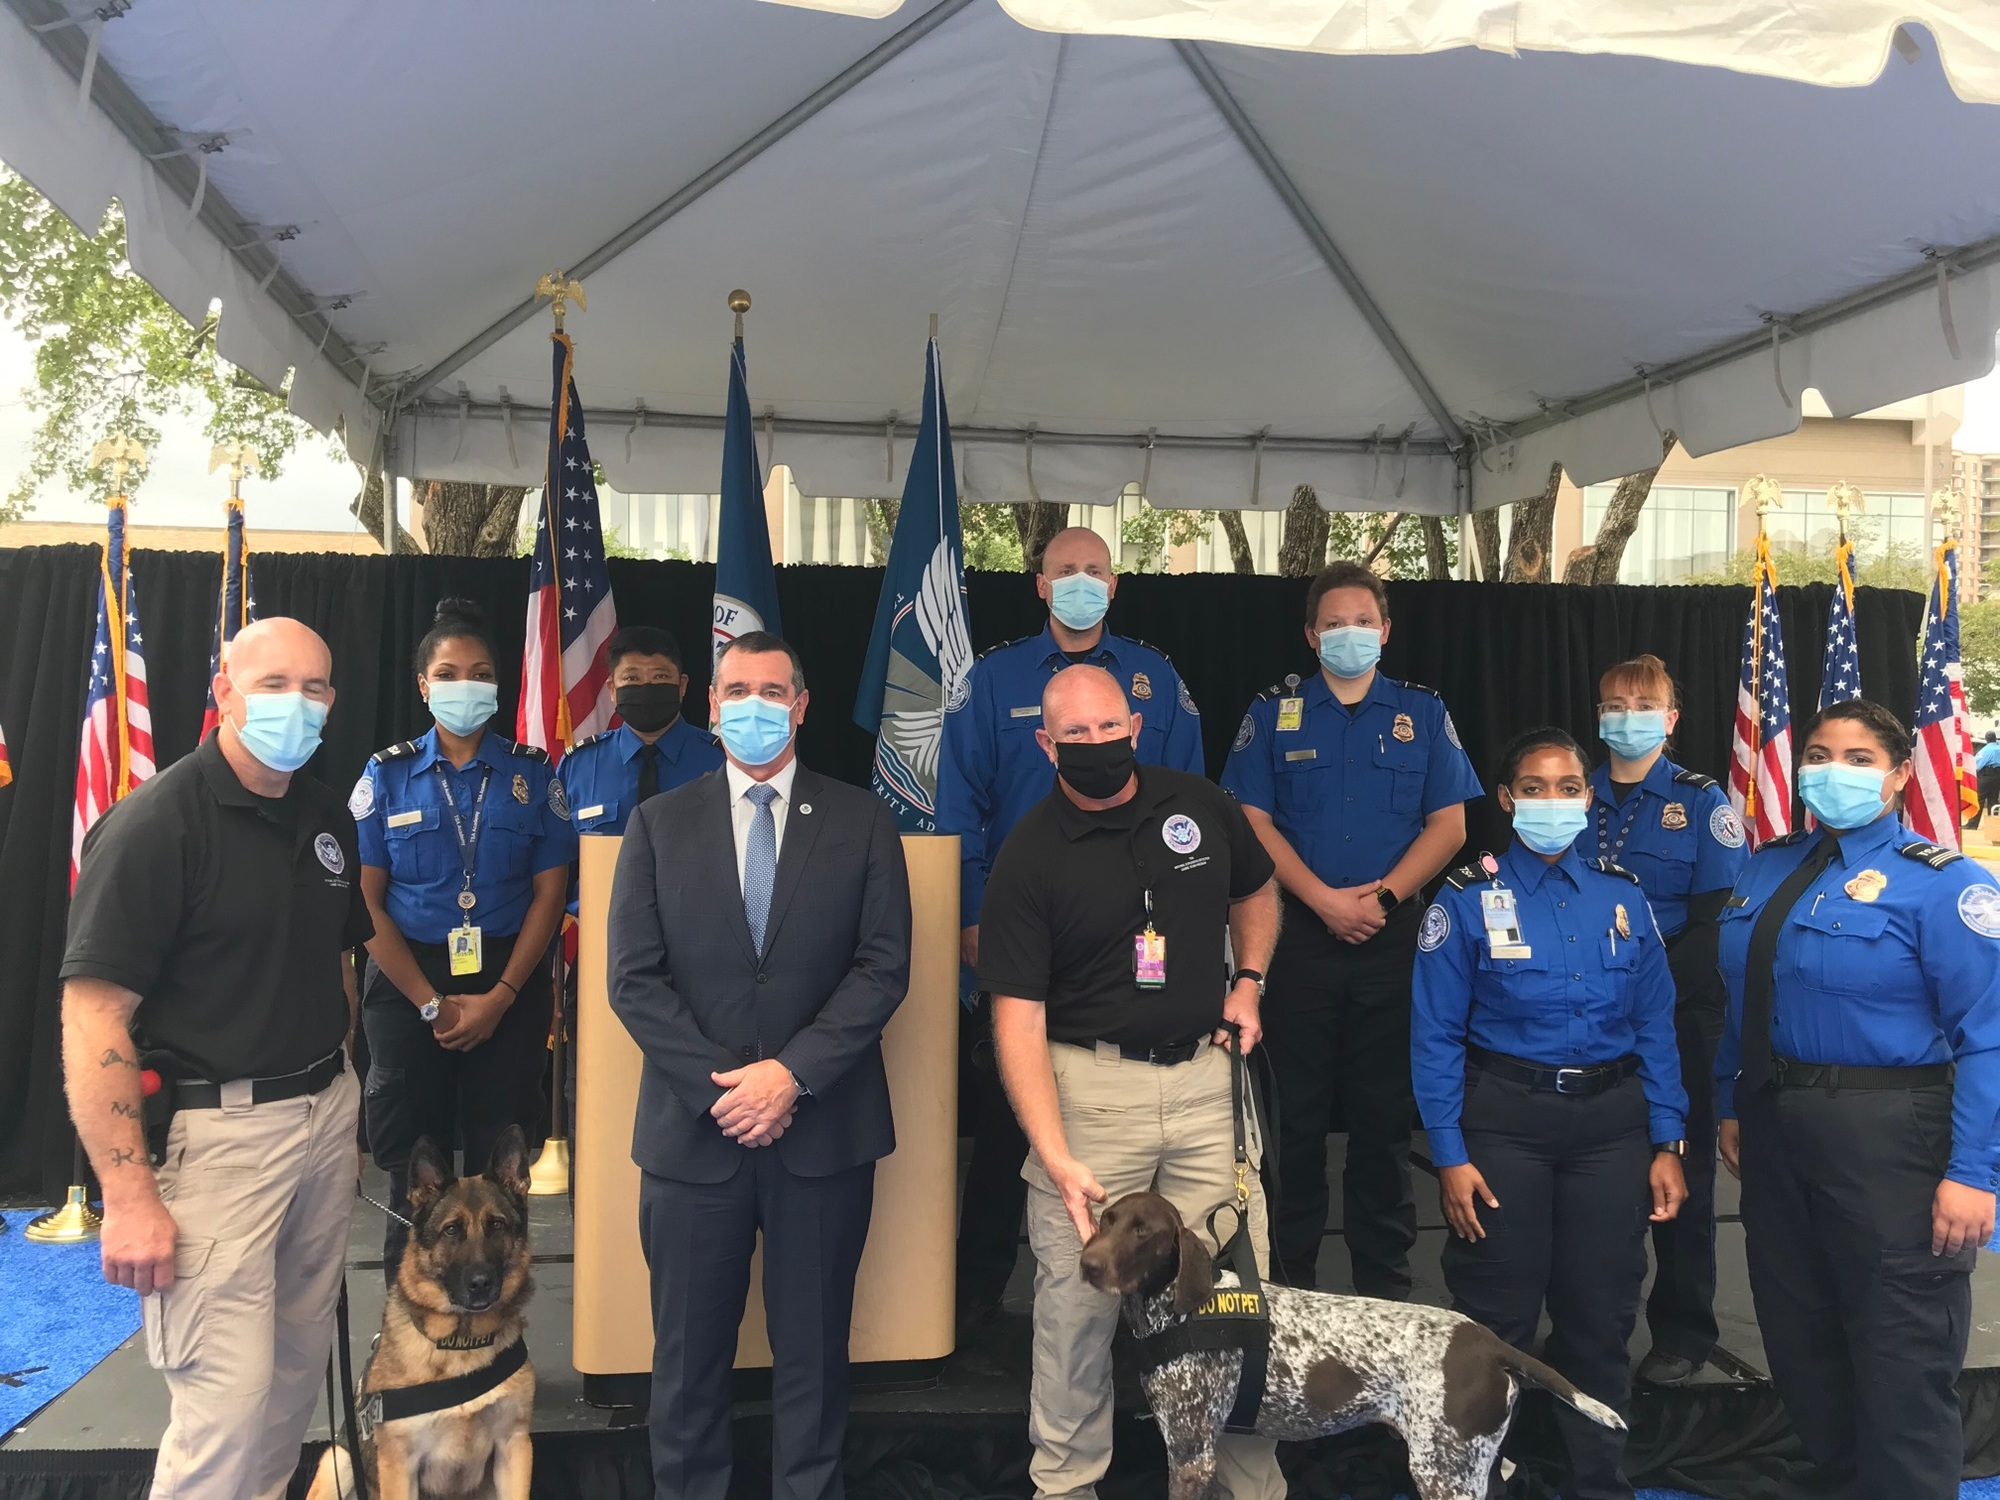 TSA Administrator David Pekoske with Transportation Security Officers at the agency's 9/11 ceremony. (TSA photo)